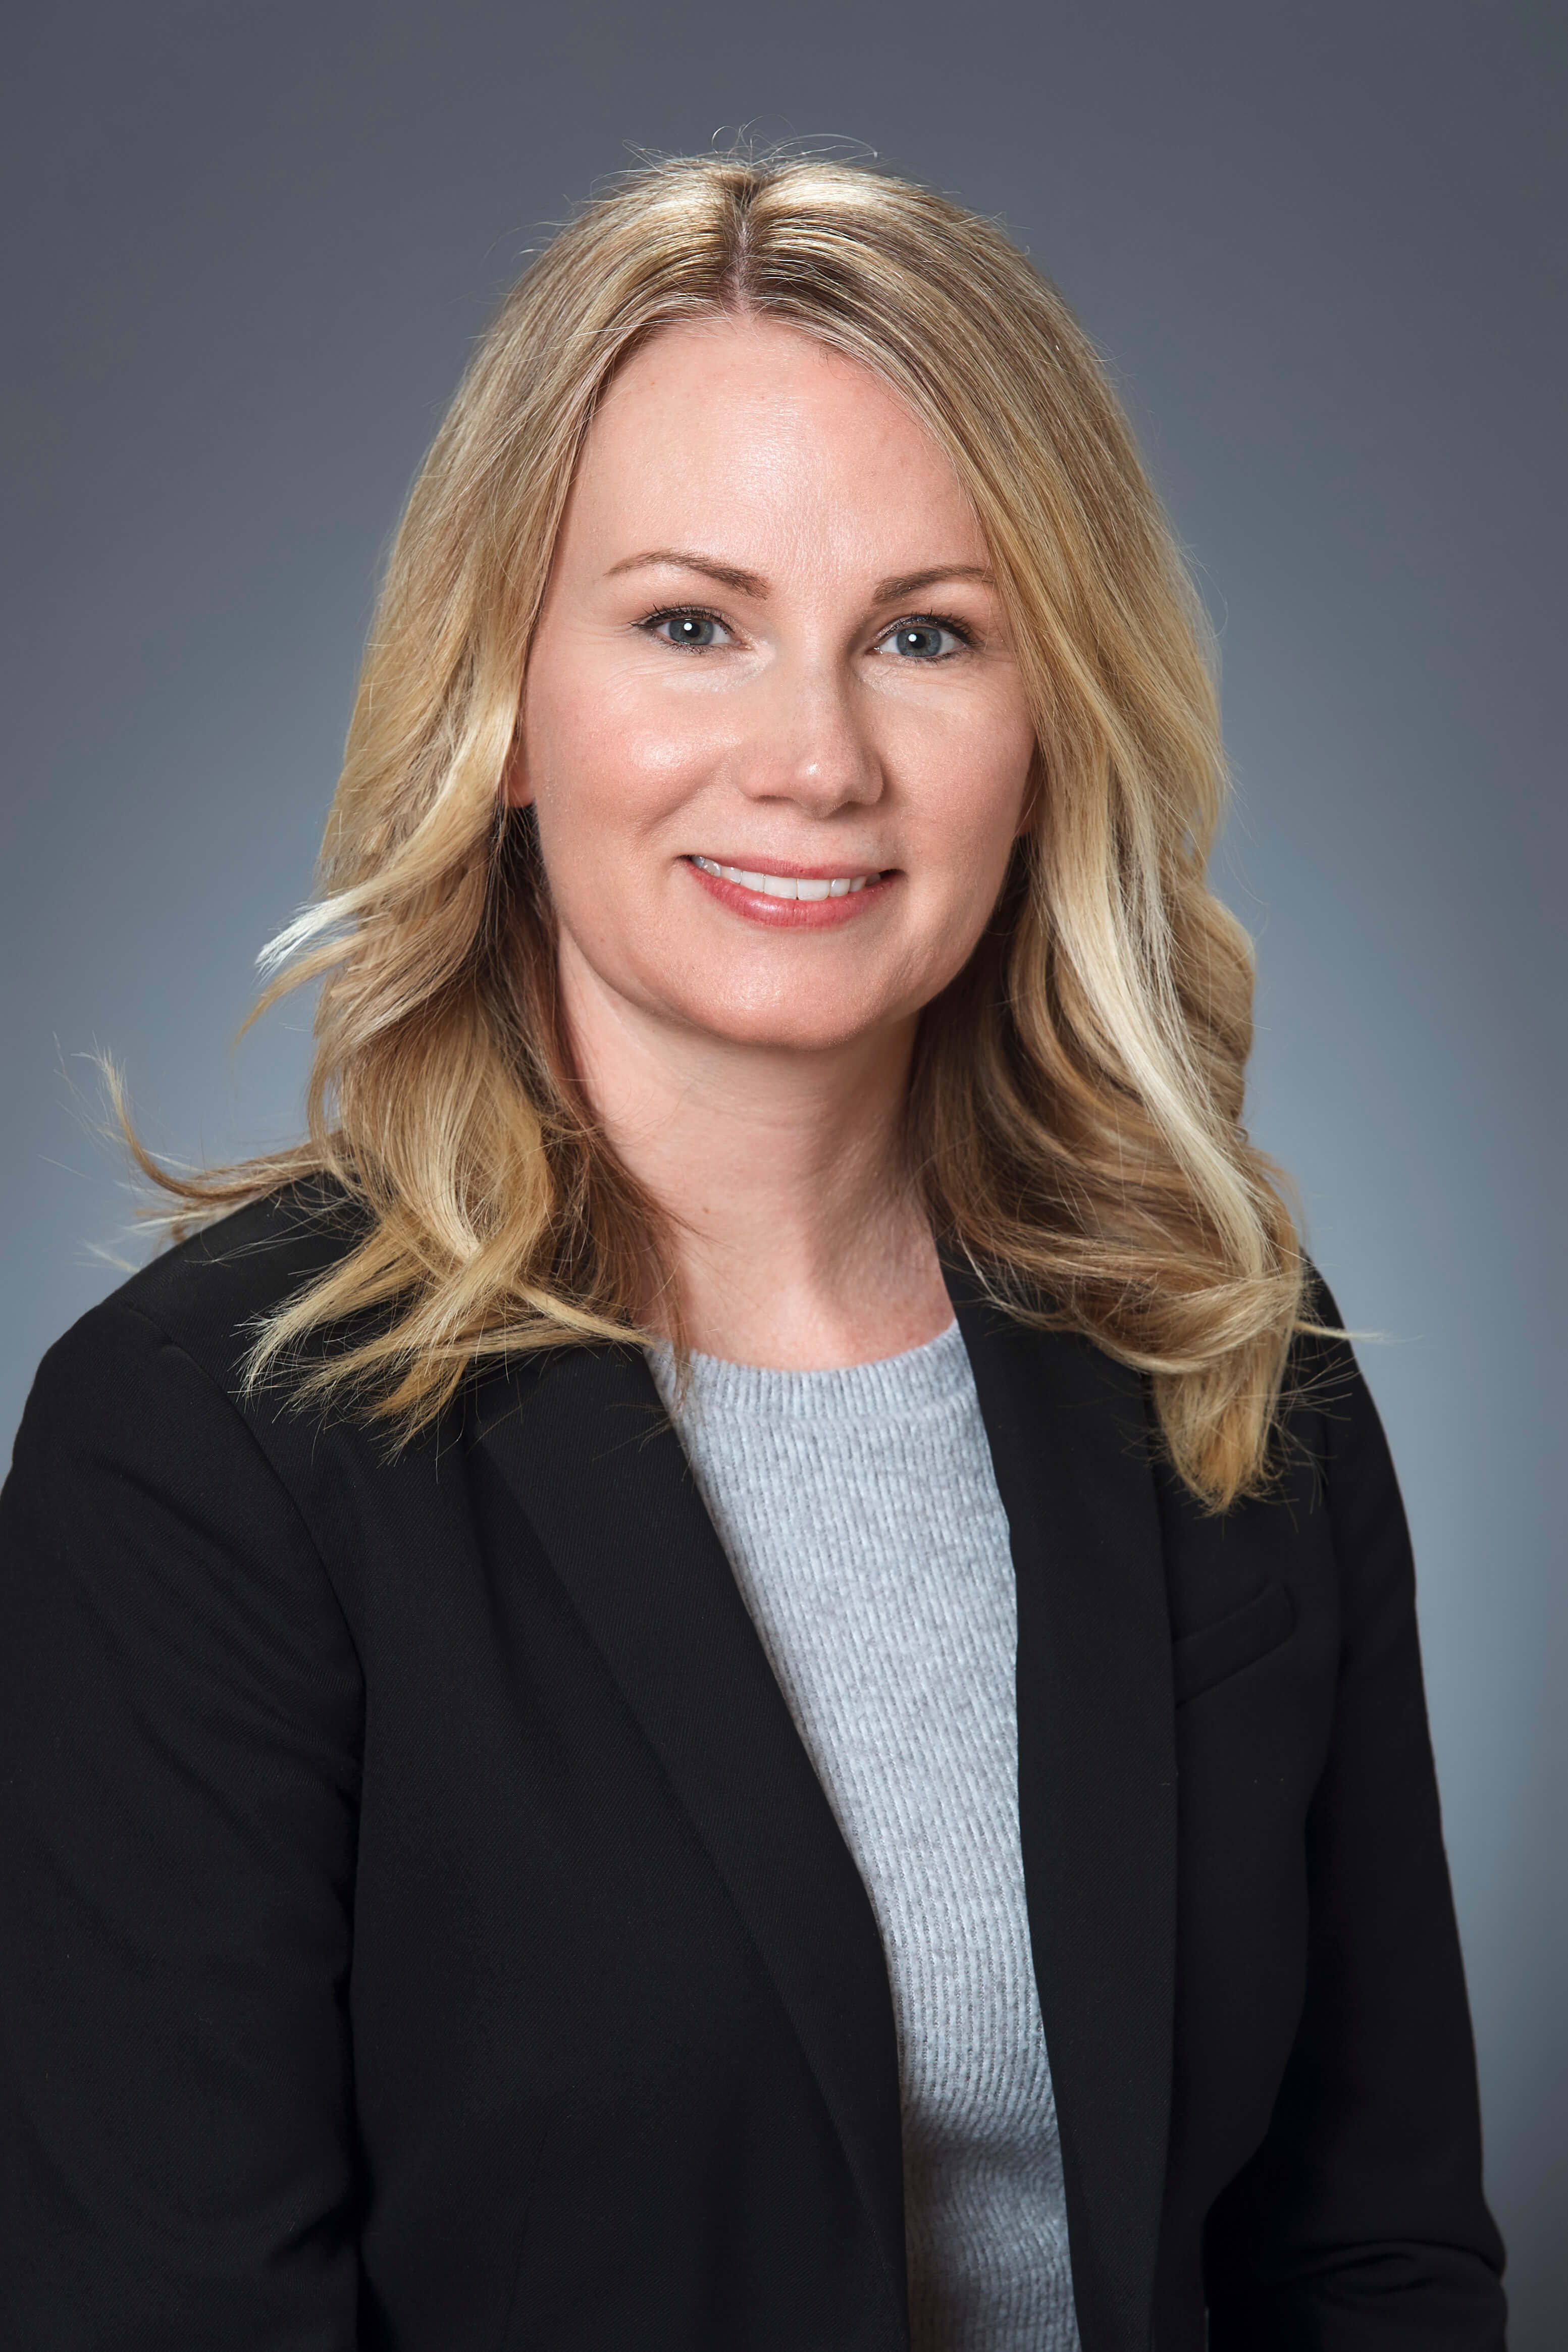 Portrait of Lisa McInery.